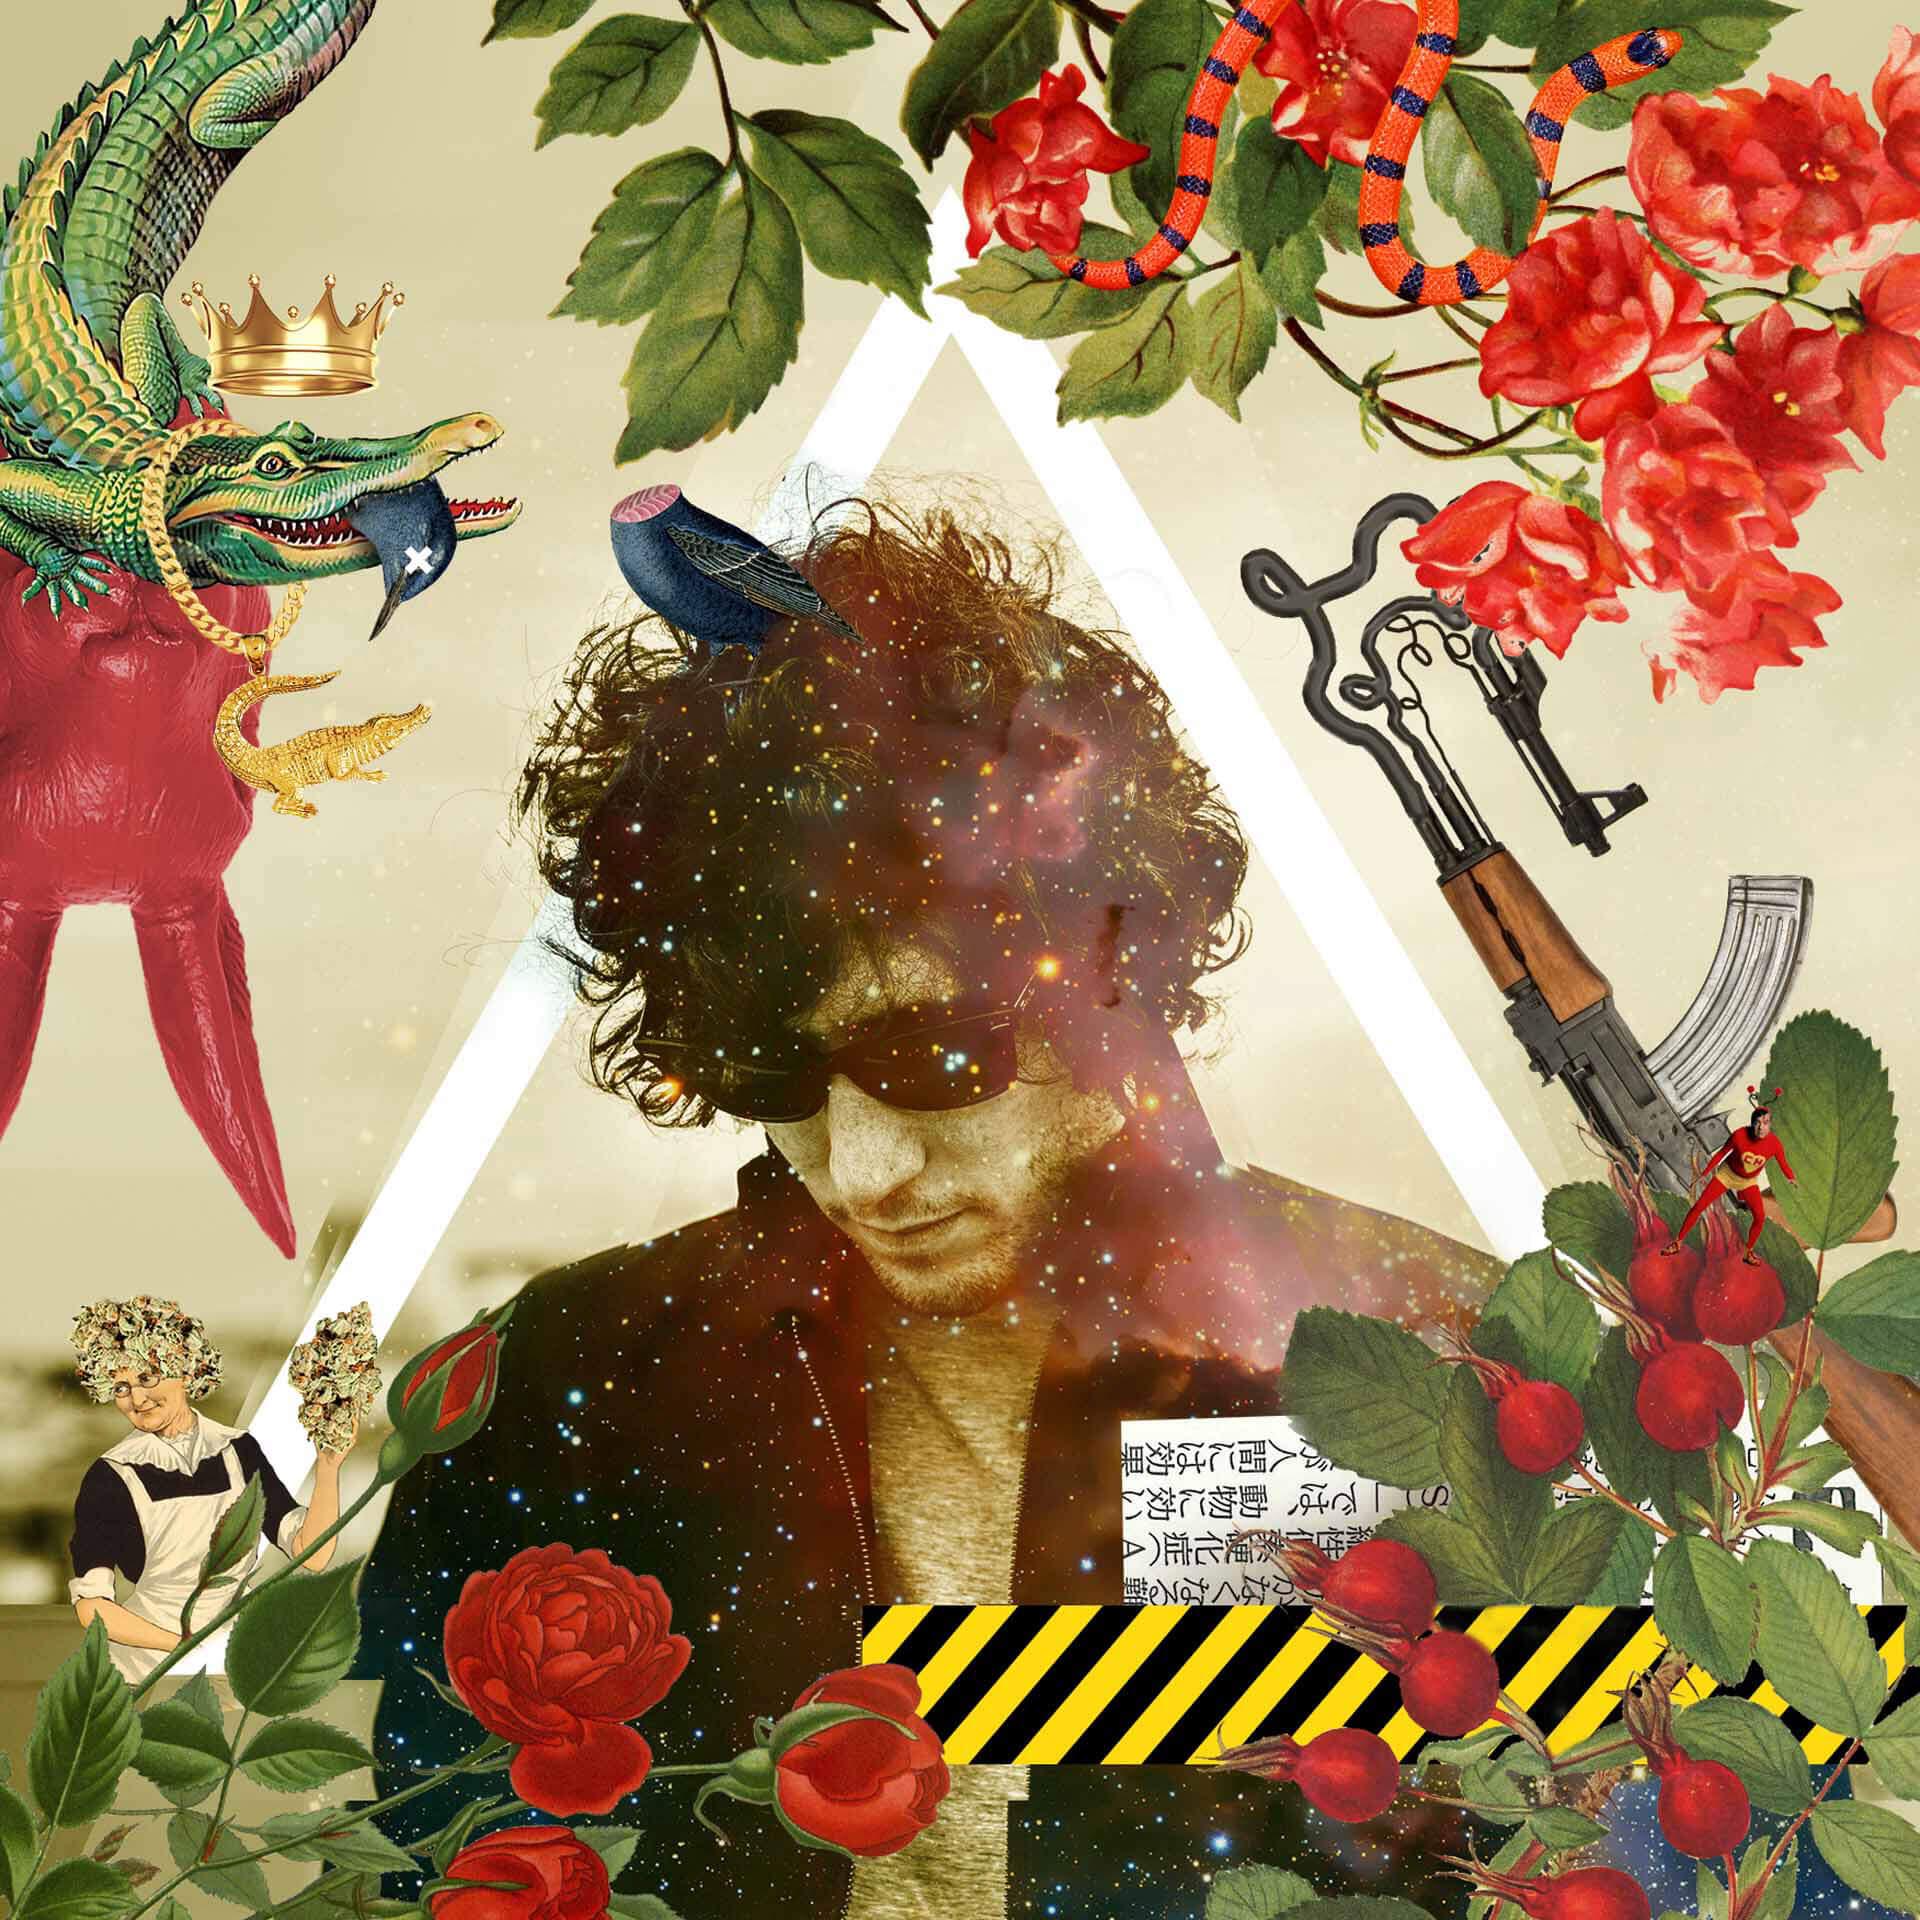 gabriel russo collage digital jardin